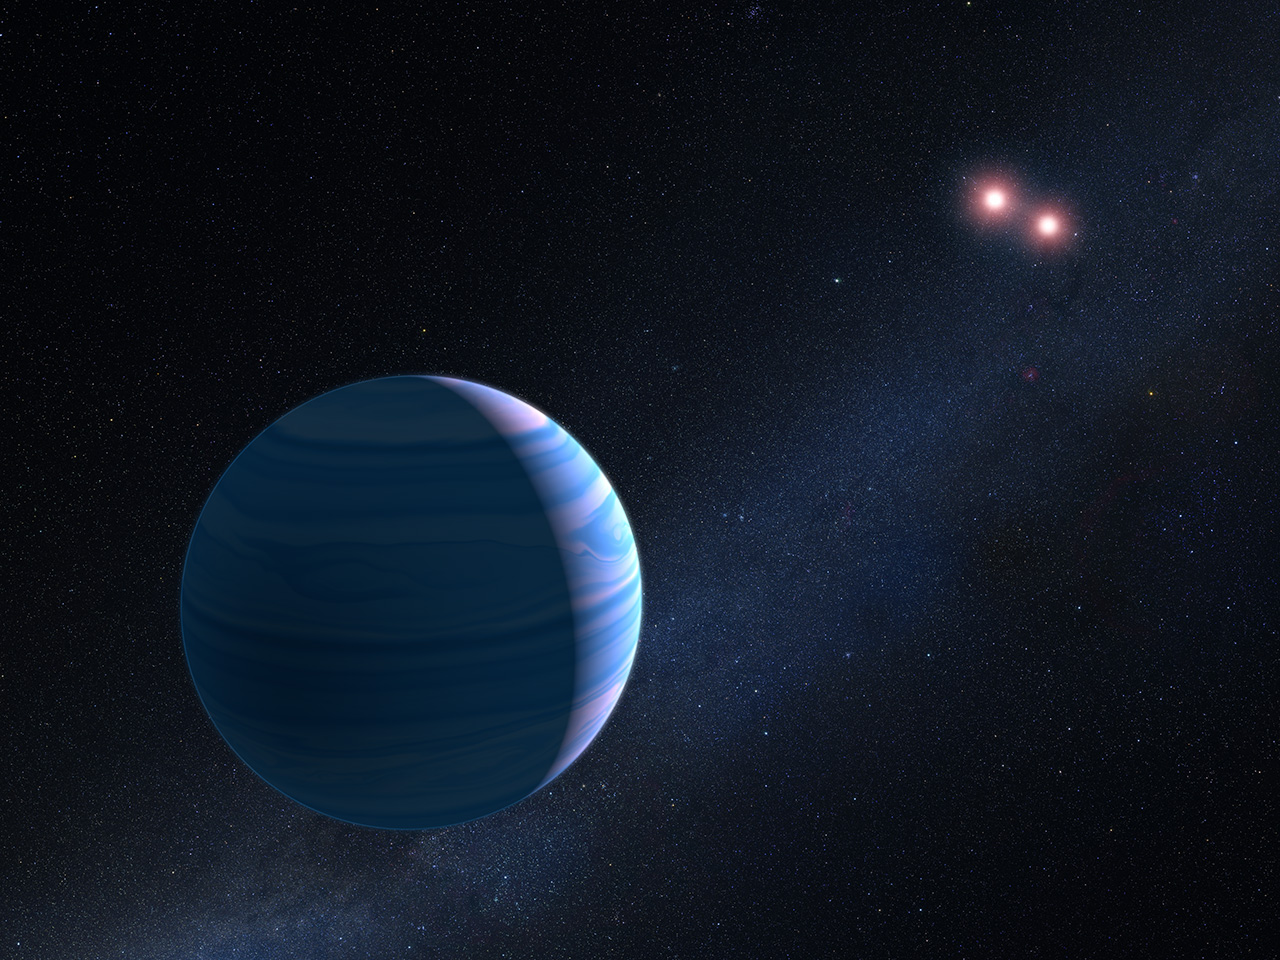 Alien Planet Has 2 Suns Instead of 1, Hubble Telescope Reveals